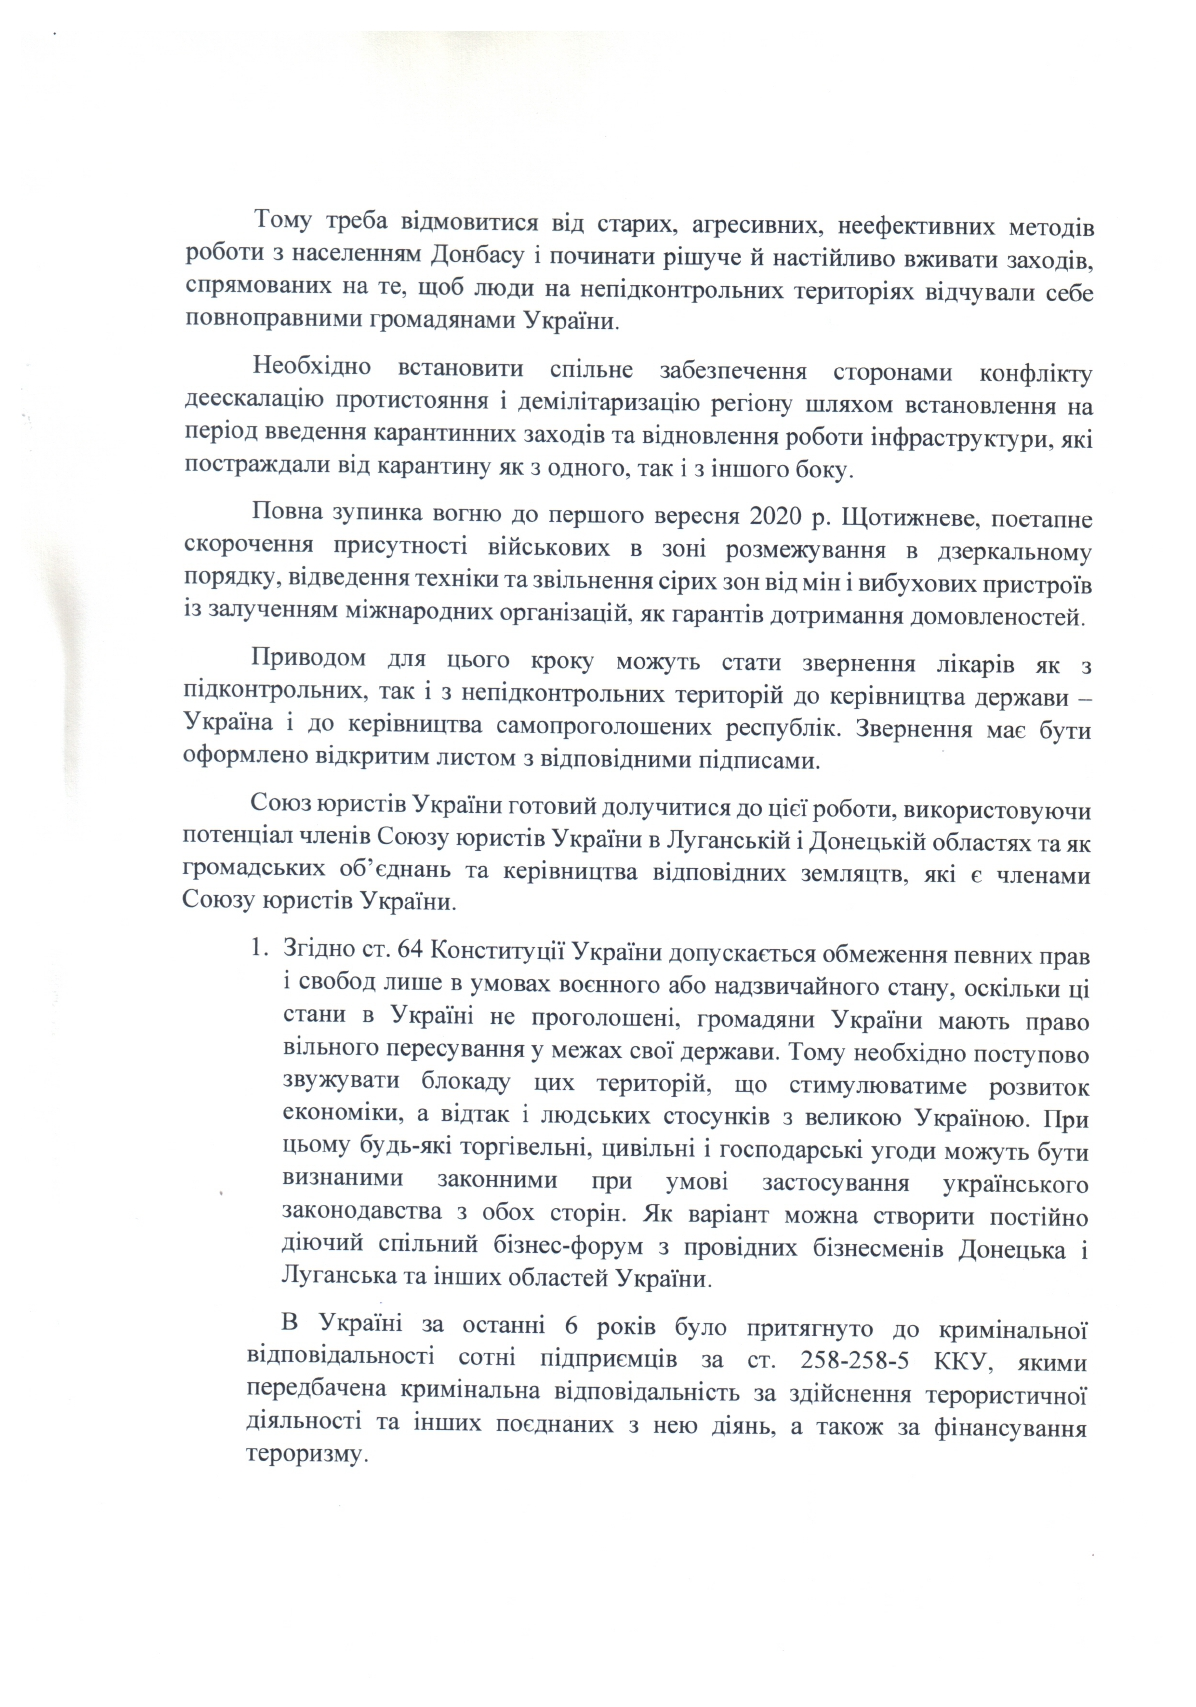 Президентові України_page-0002